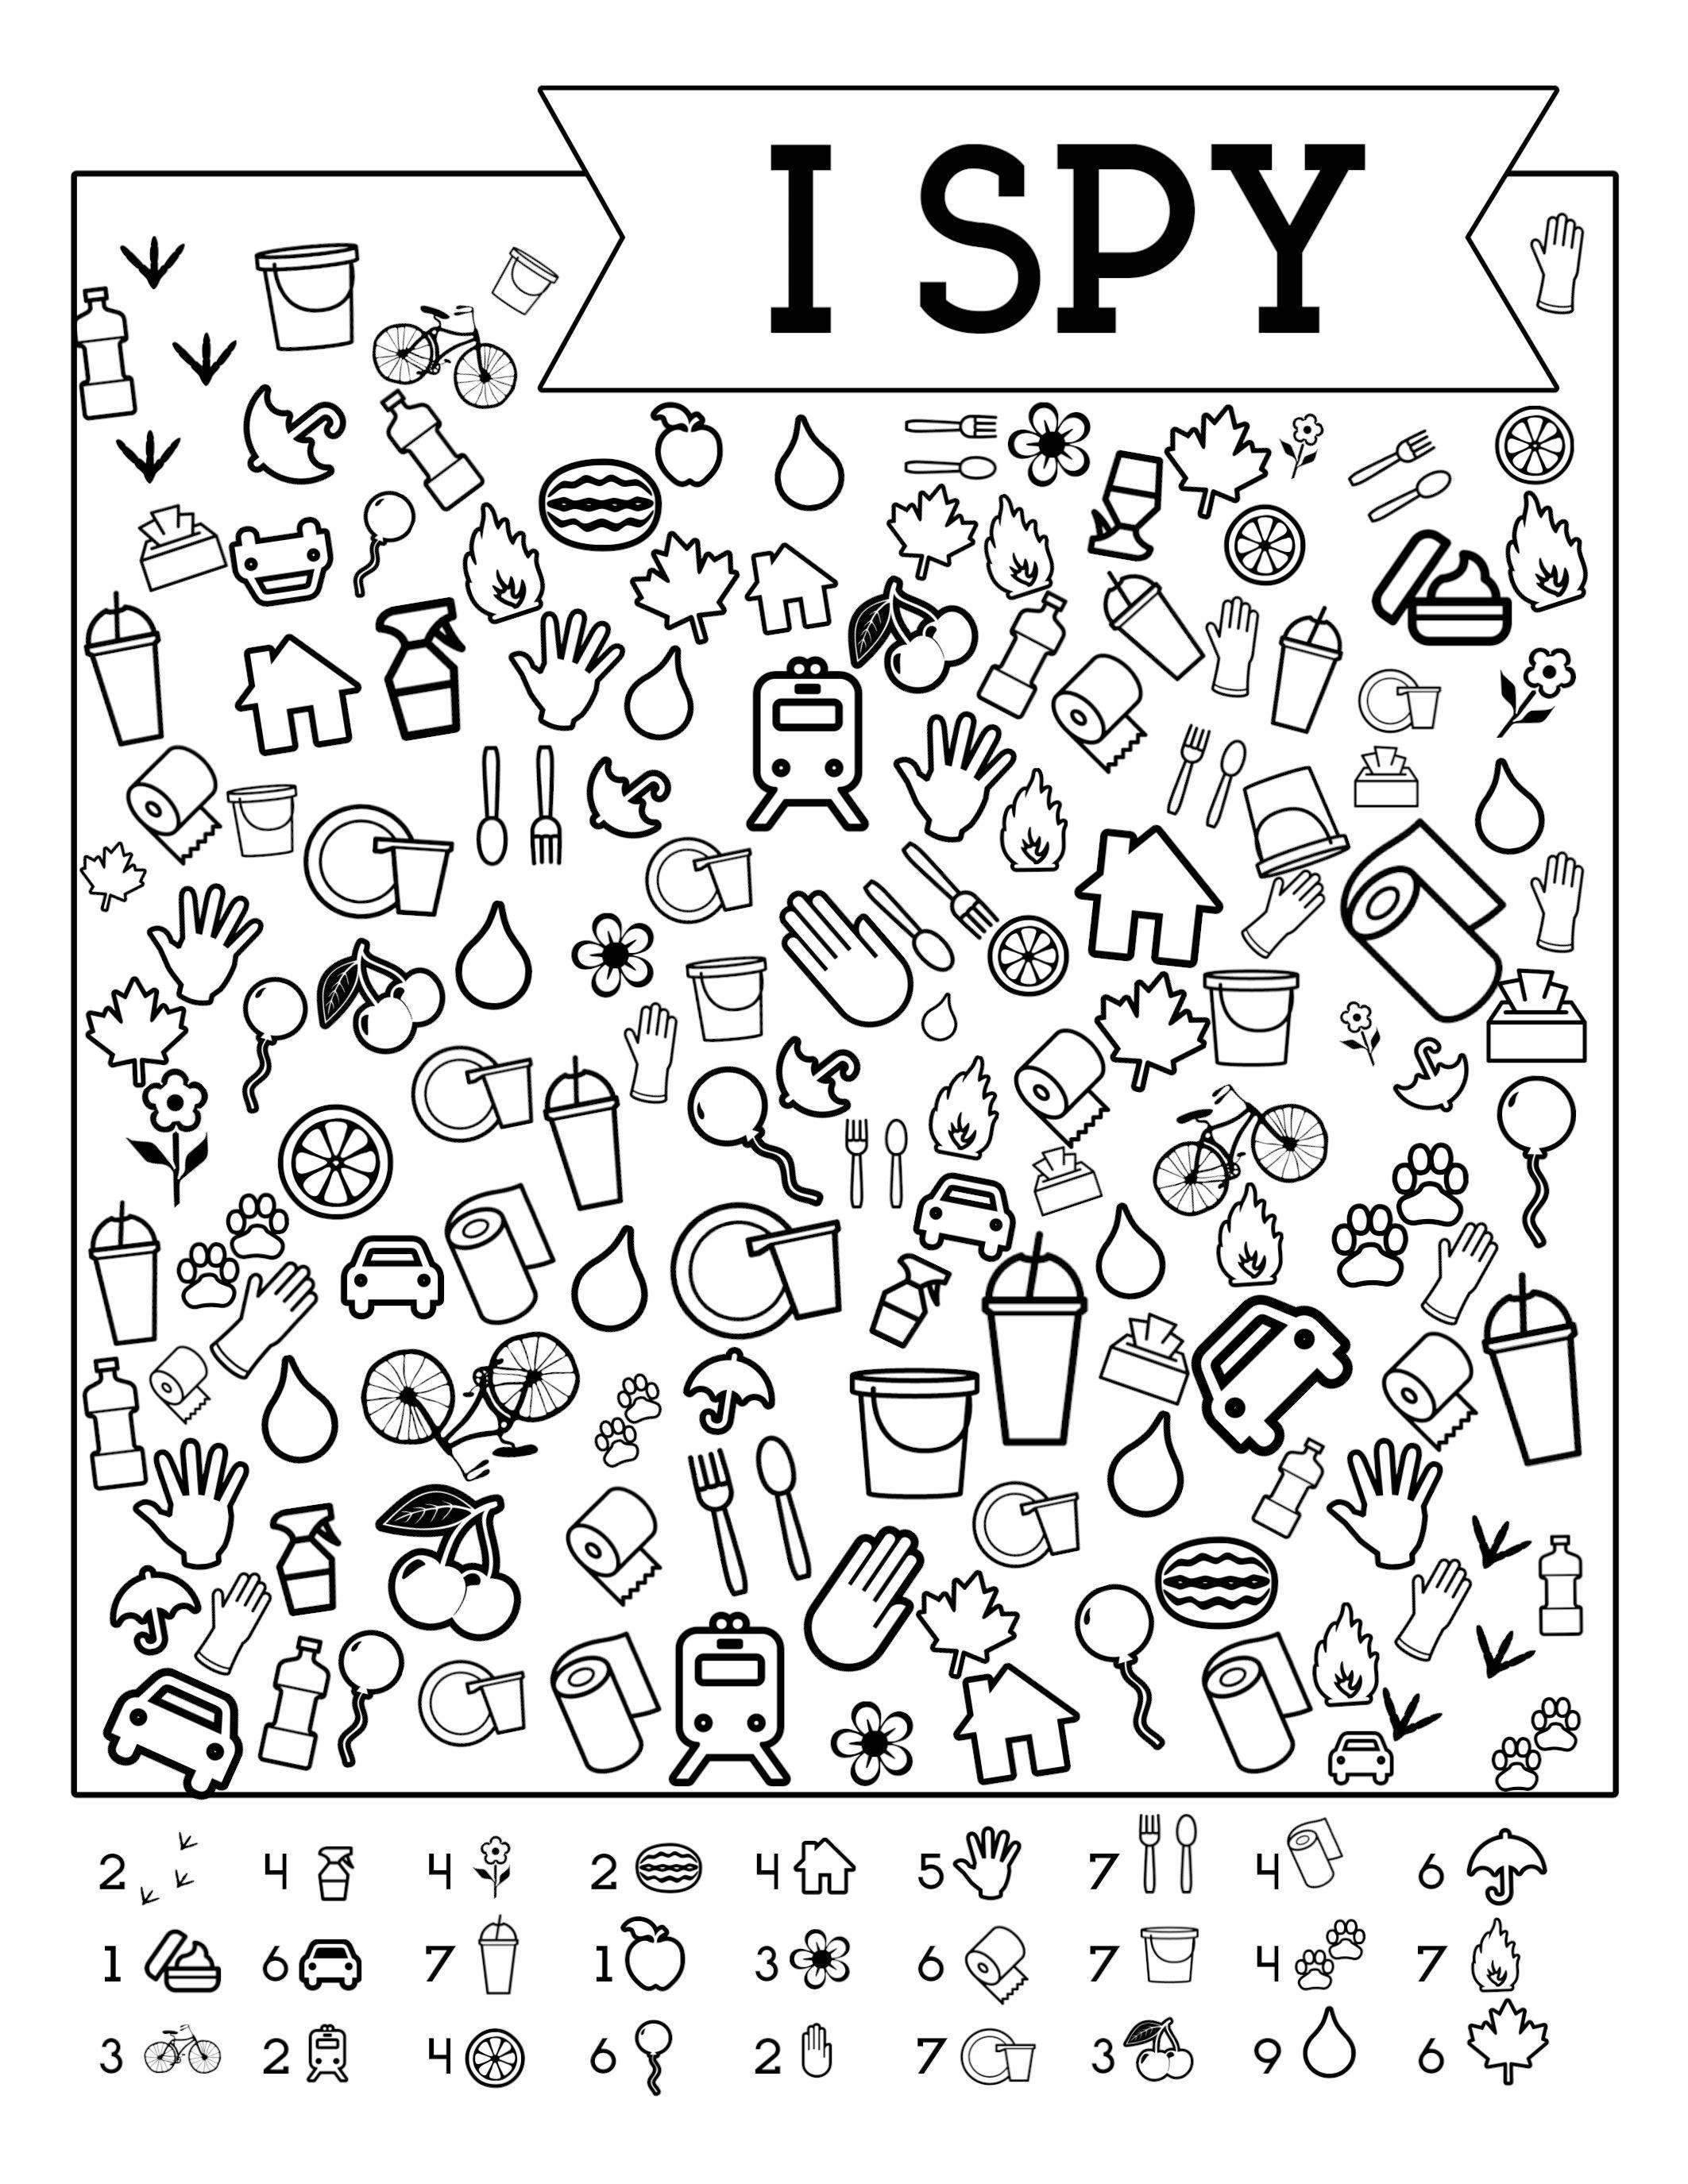 I-Spy-Free-Printable-Kids-Game | Spy School Camp | Spy Games For - Free Printable I Spy Puzzles